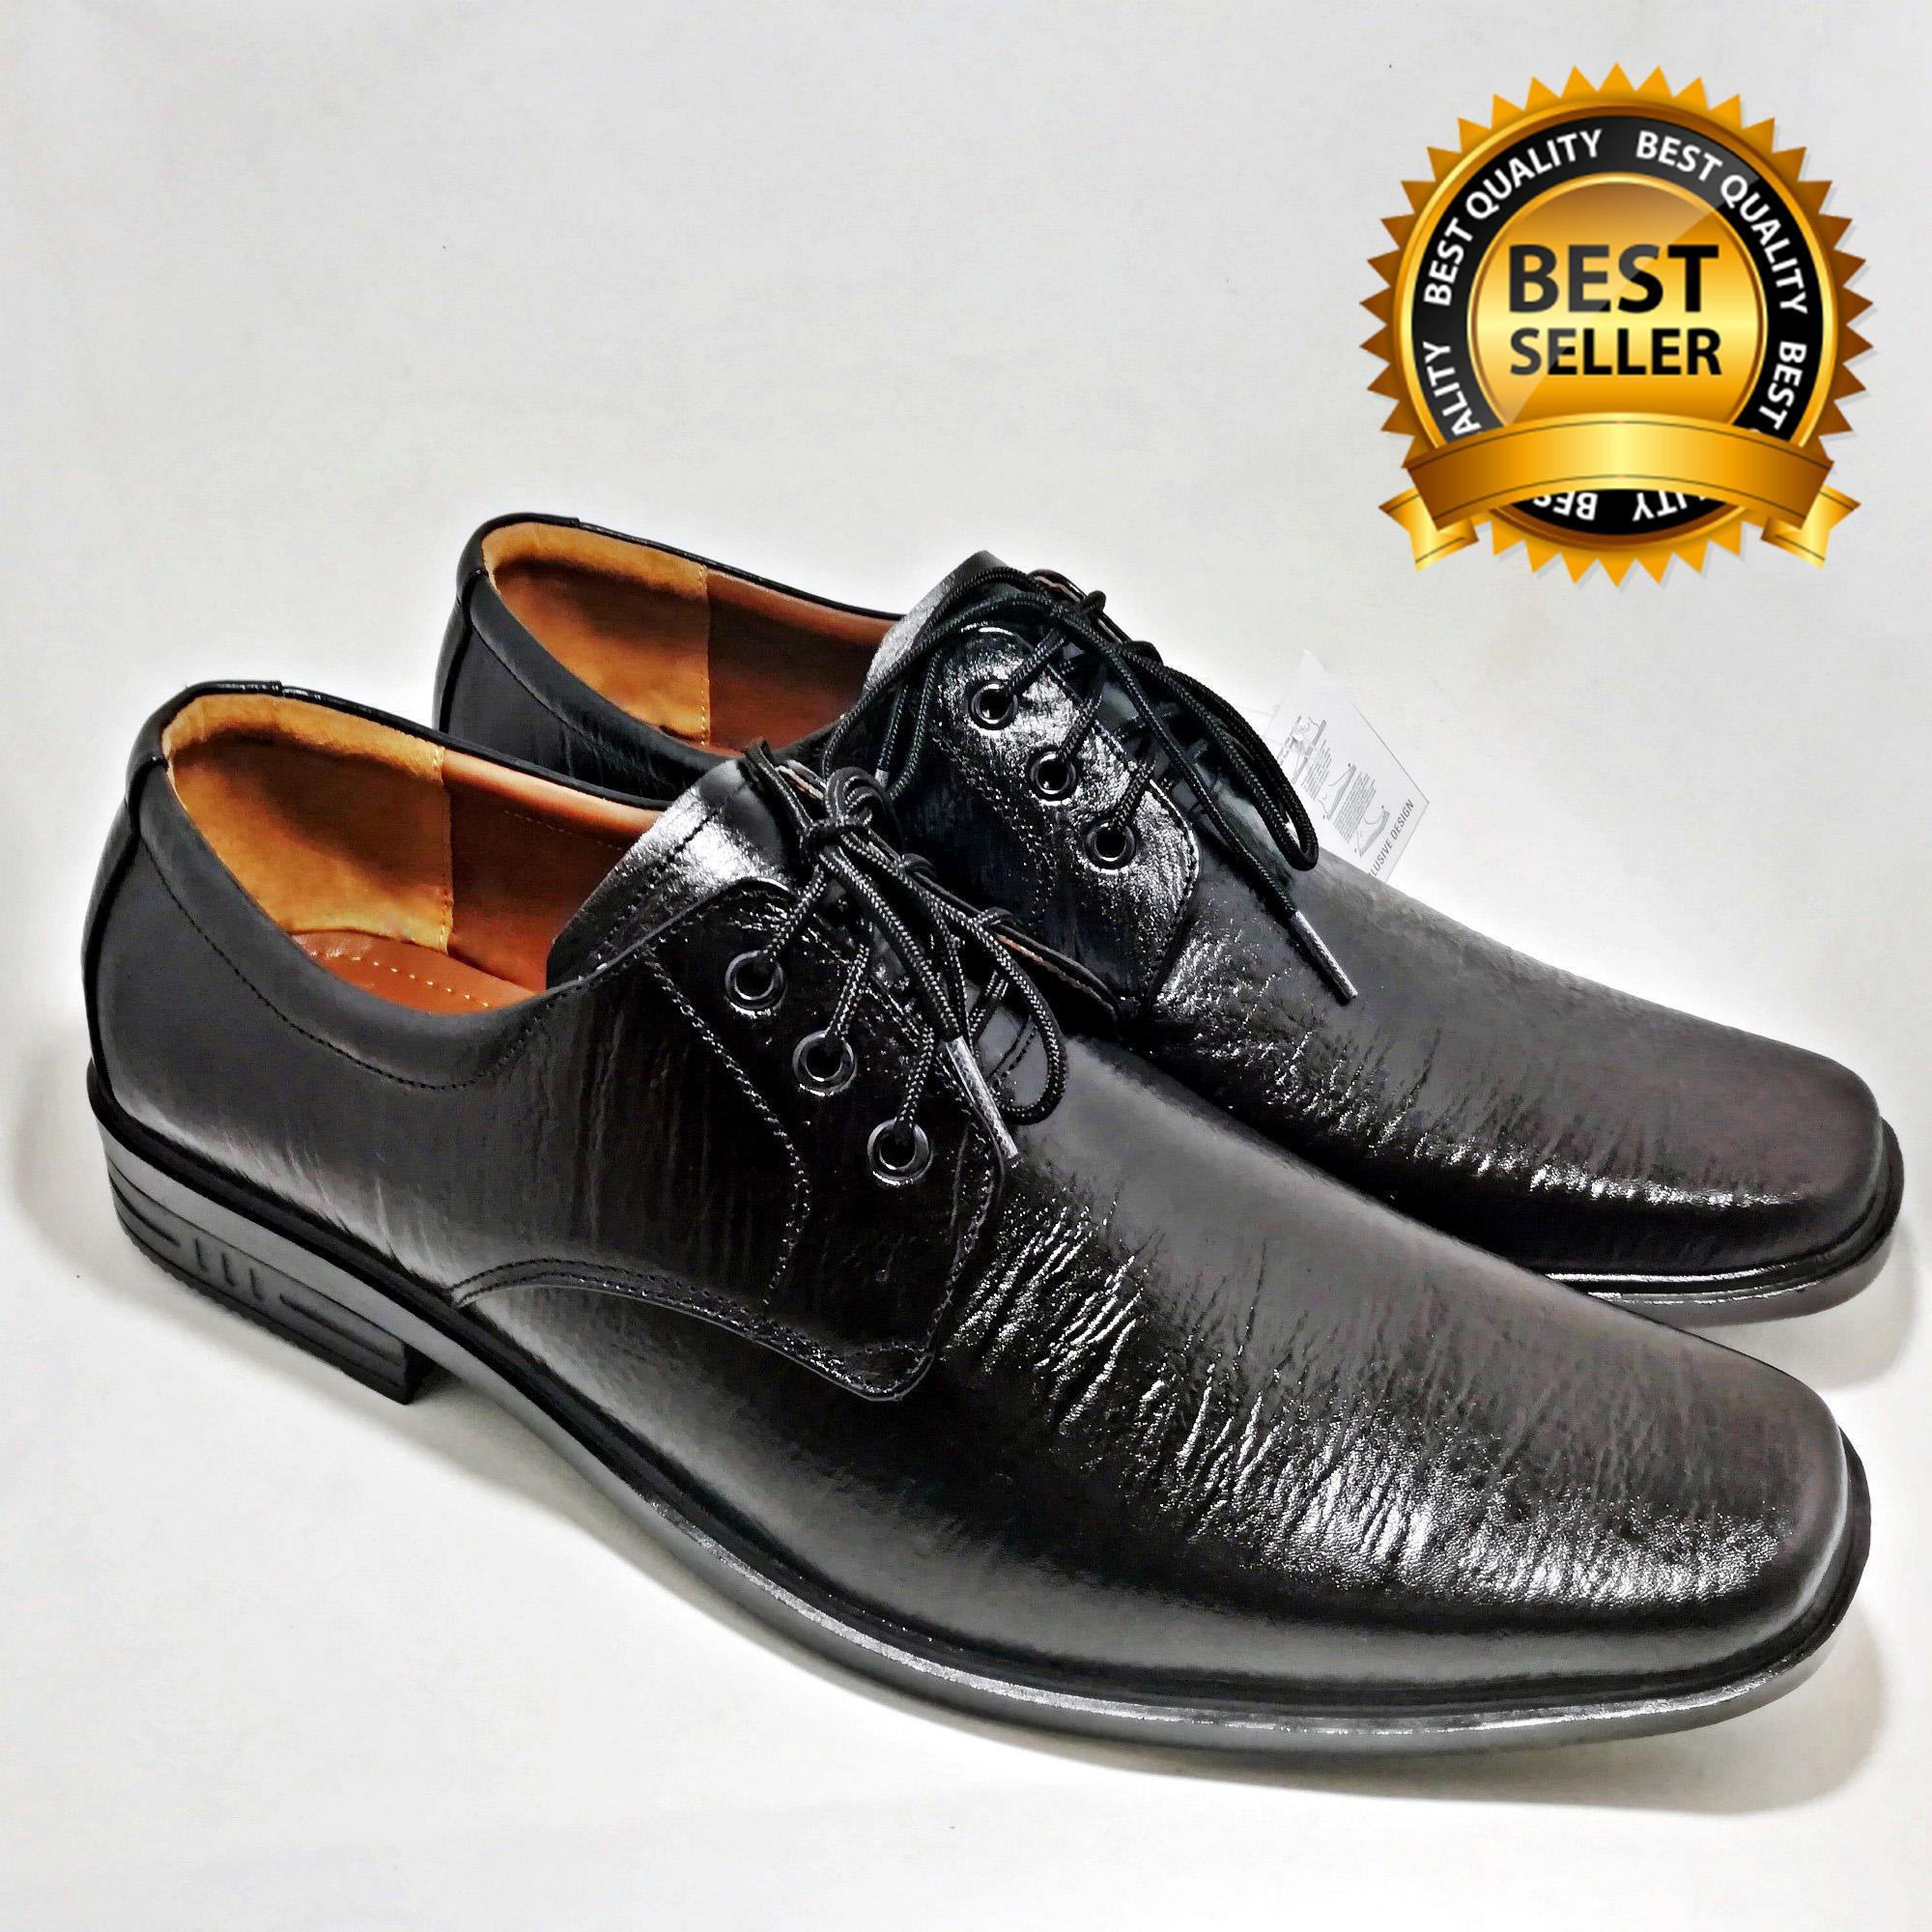 Sepatu Tali Kantor Pria Kulit Asli 100% Bukan Sintetis Tekstur Serat Kayu  Pantofel Big Size f2cb80b2c8